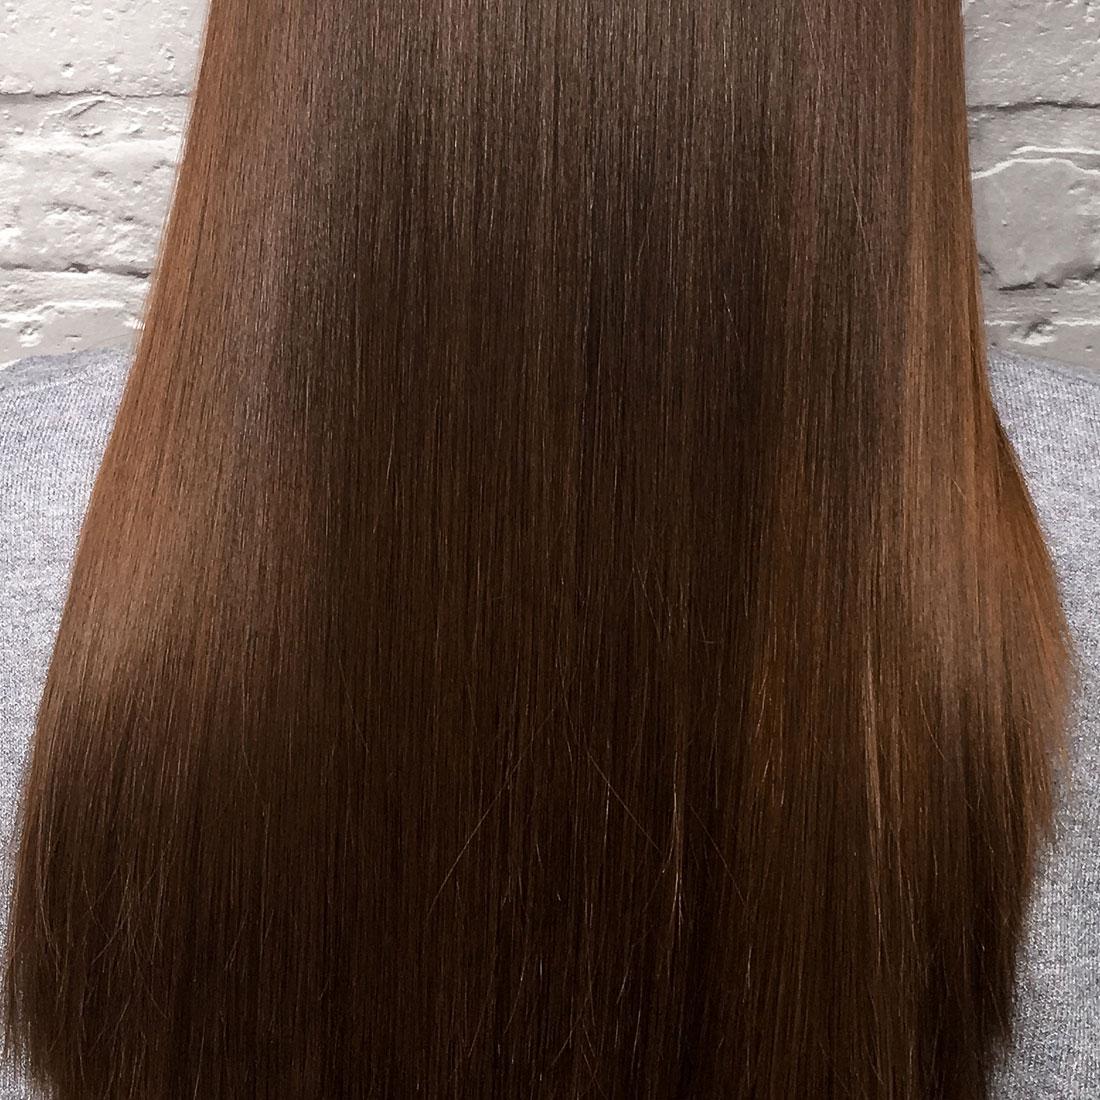 GK Keratin Hair Treatment